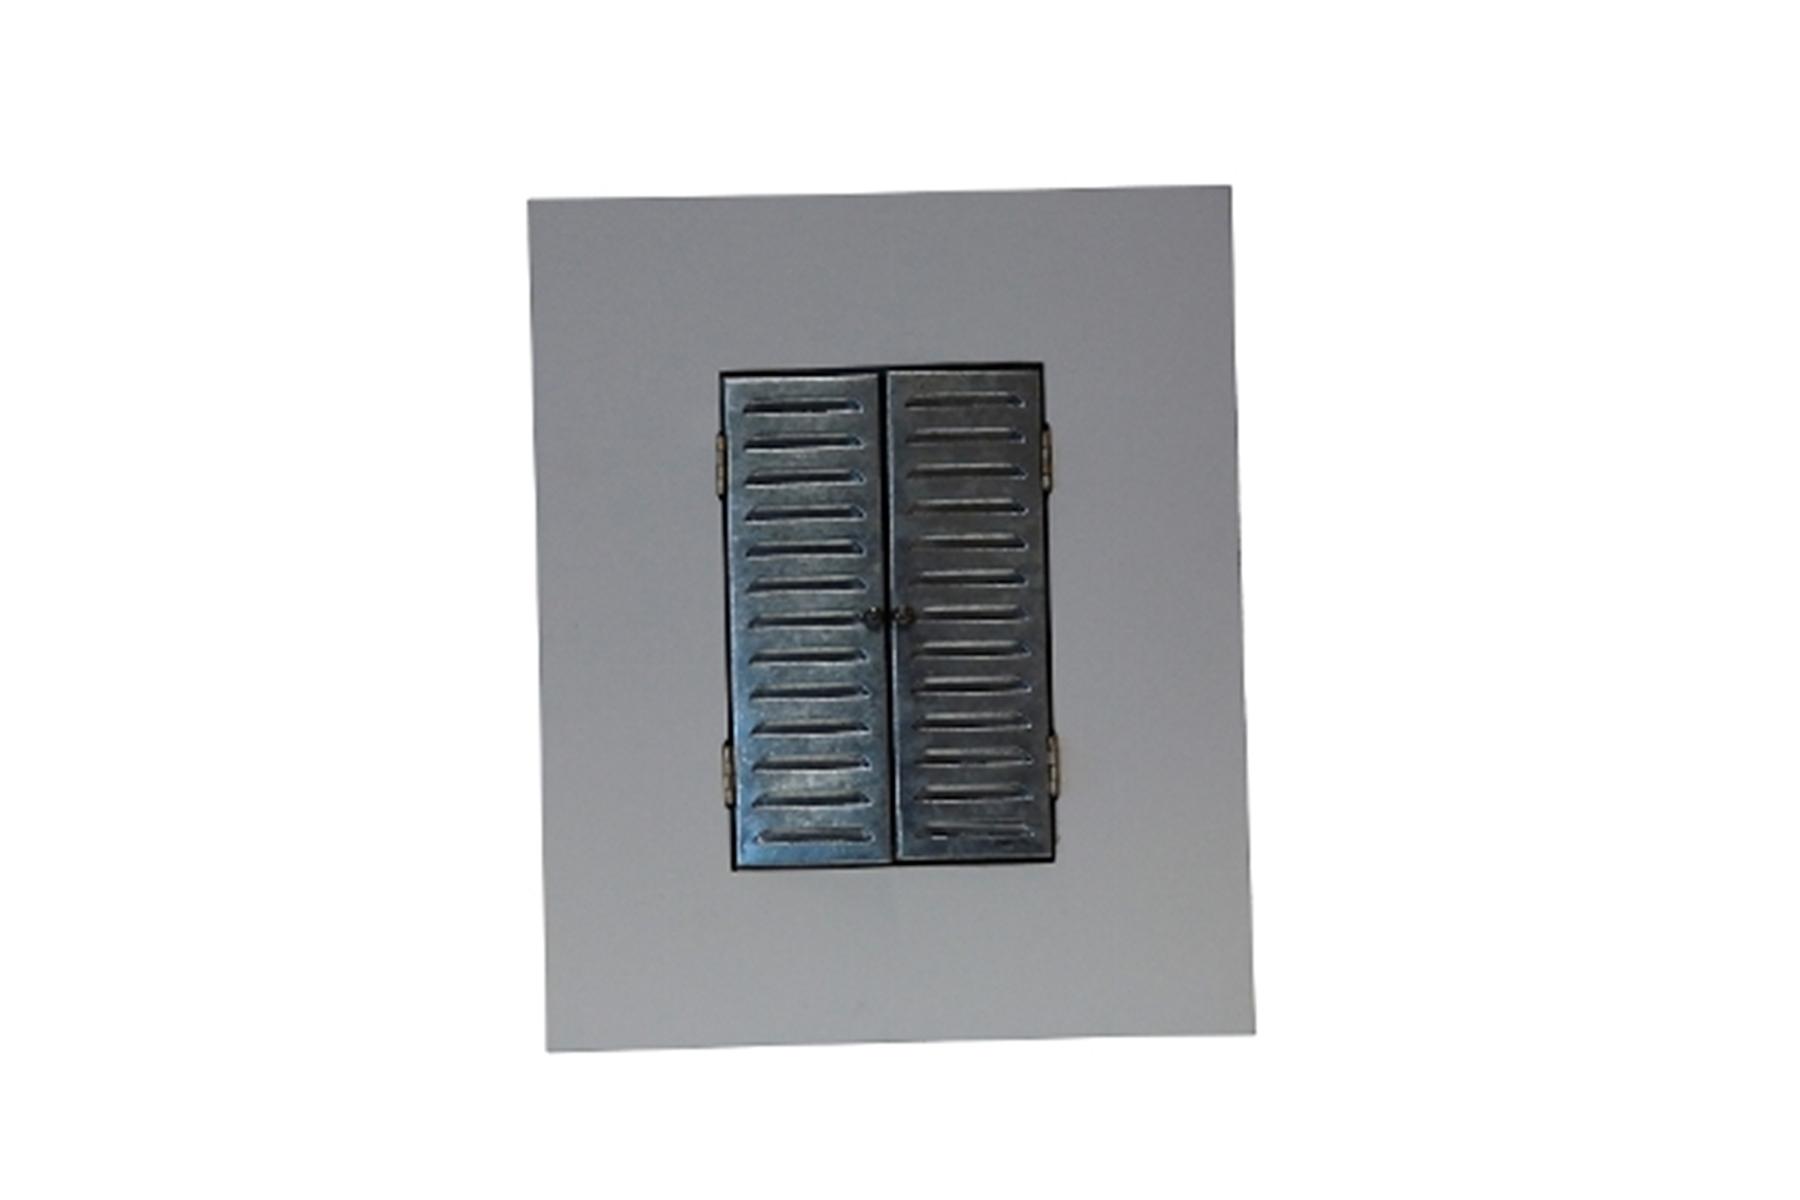 Bilderrahmen weiß Metall Fensterladen | elbmöbel online shop